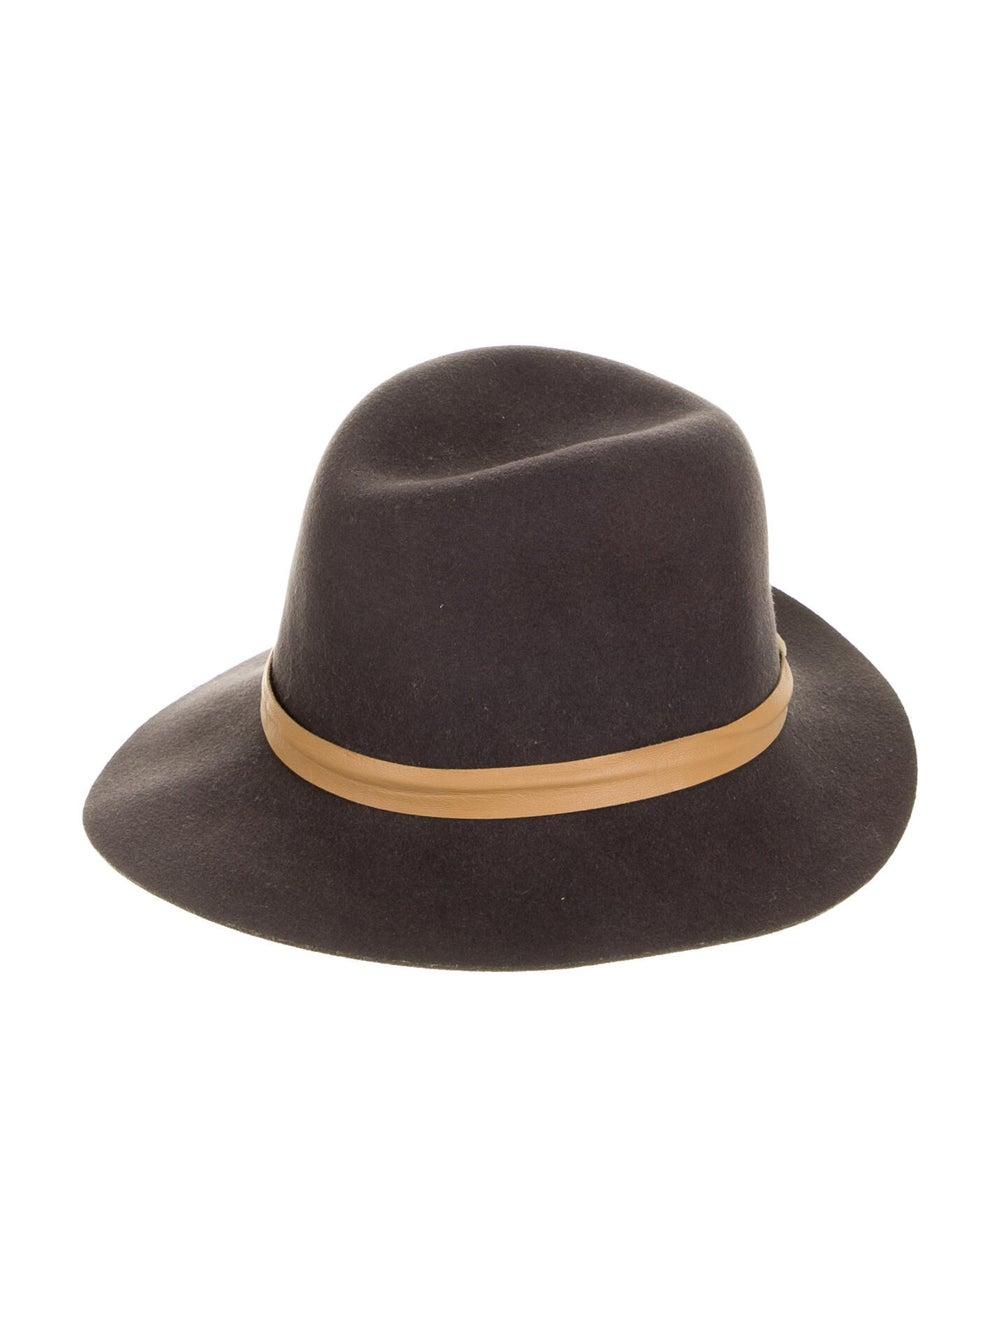 Janessa Leone Wool Fedora Hat brown - image 1